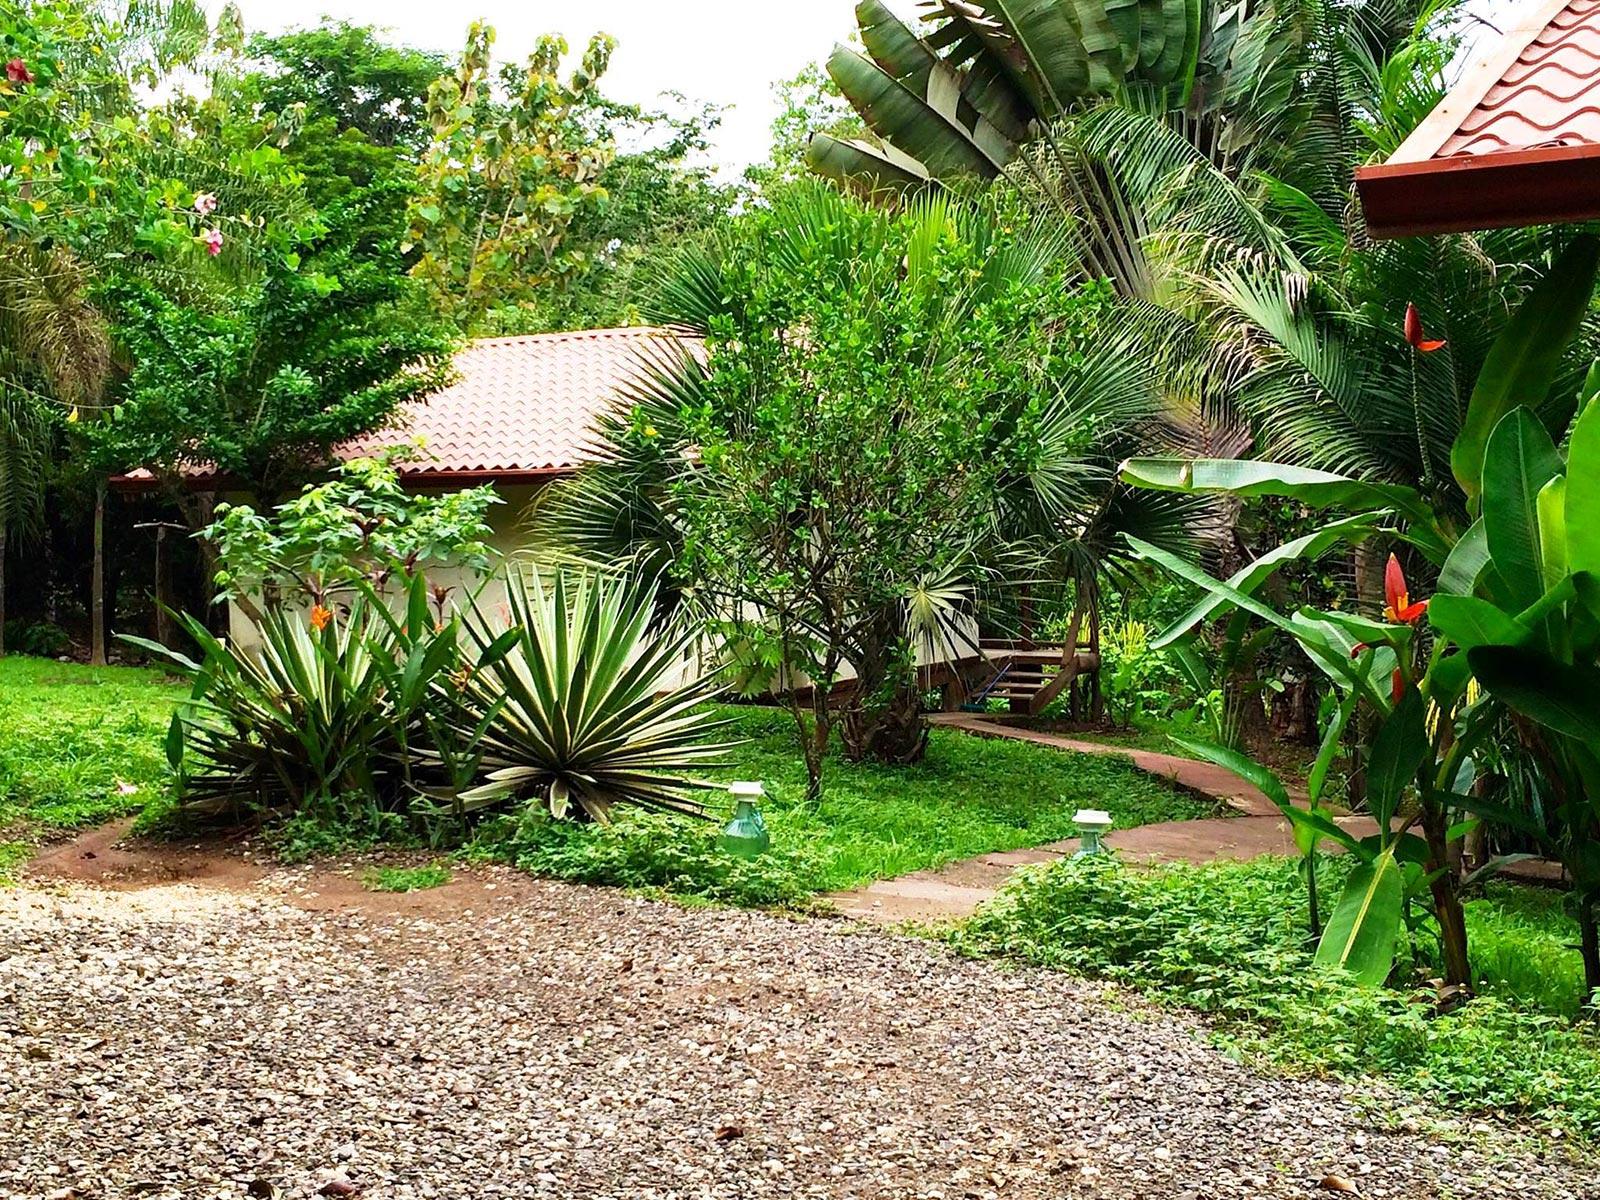 Small Hotel for Sale Close to Montezuma Beaches, ID CODE: #3311